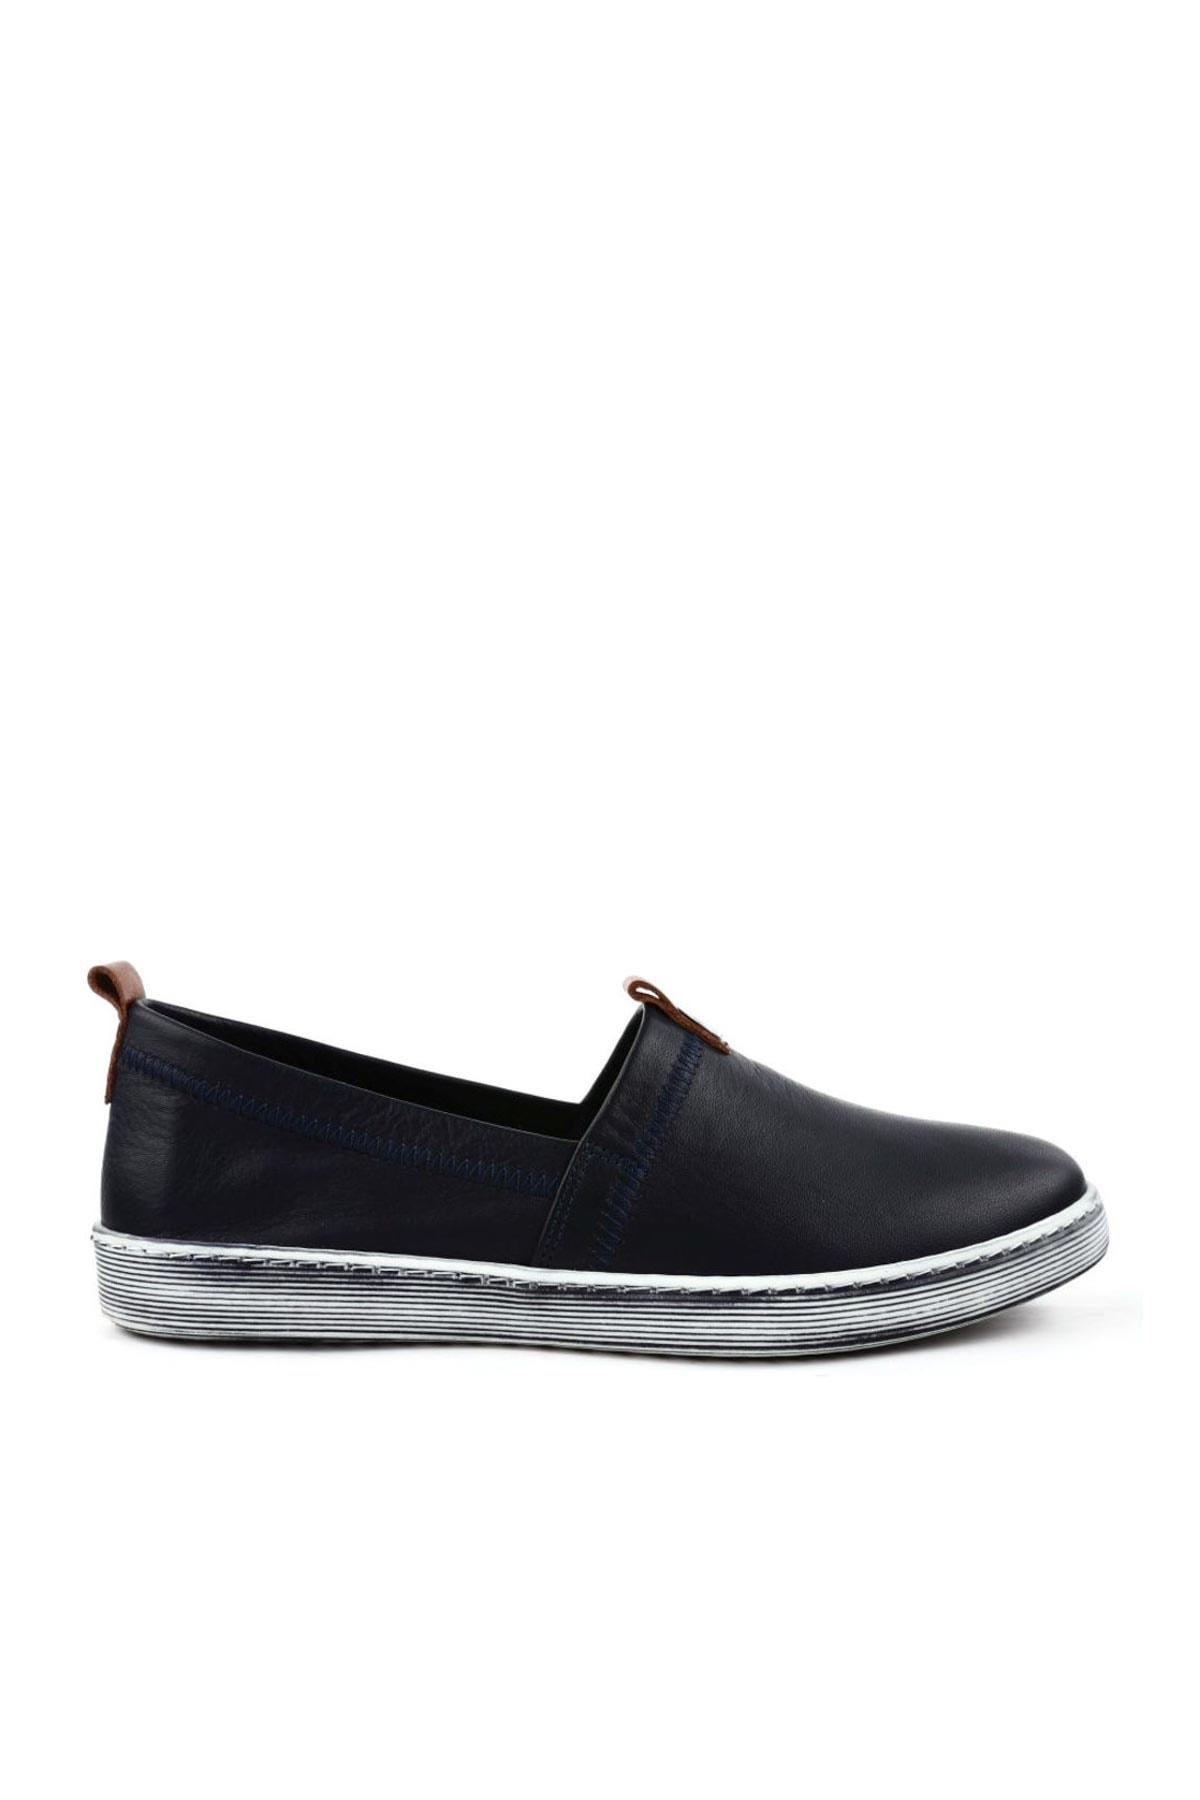 Mammamia Laci Faber Kadın Ayakkabı